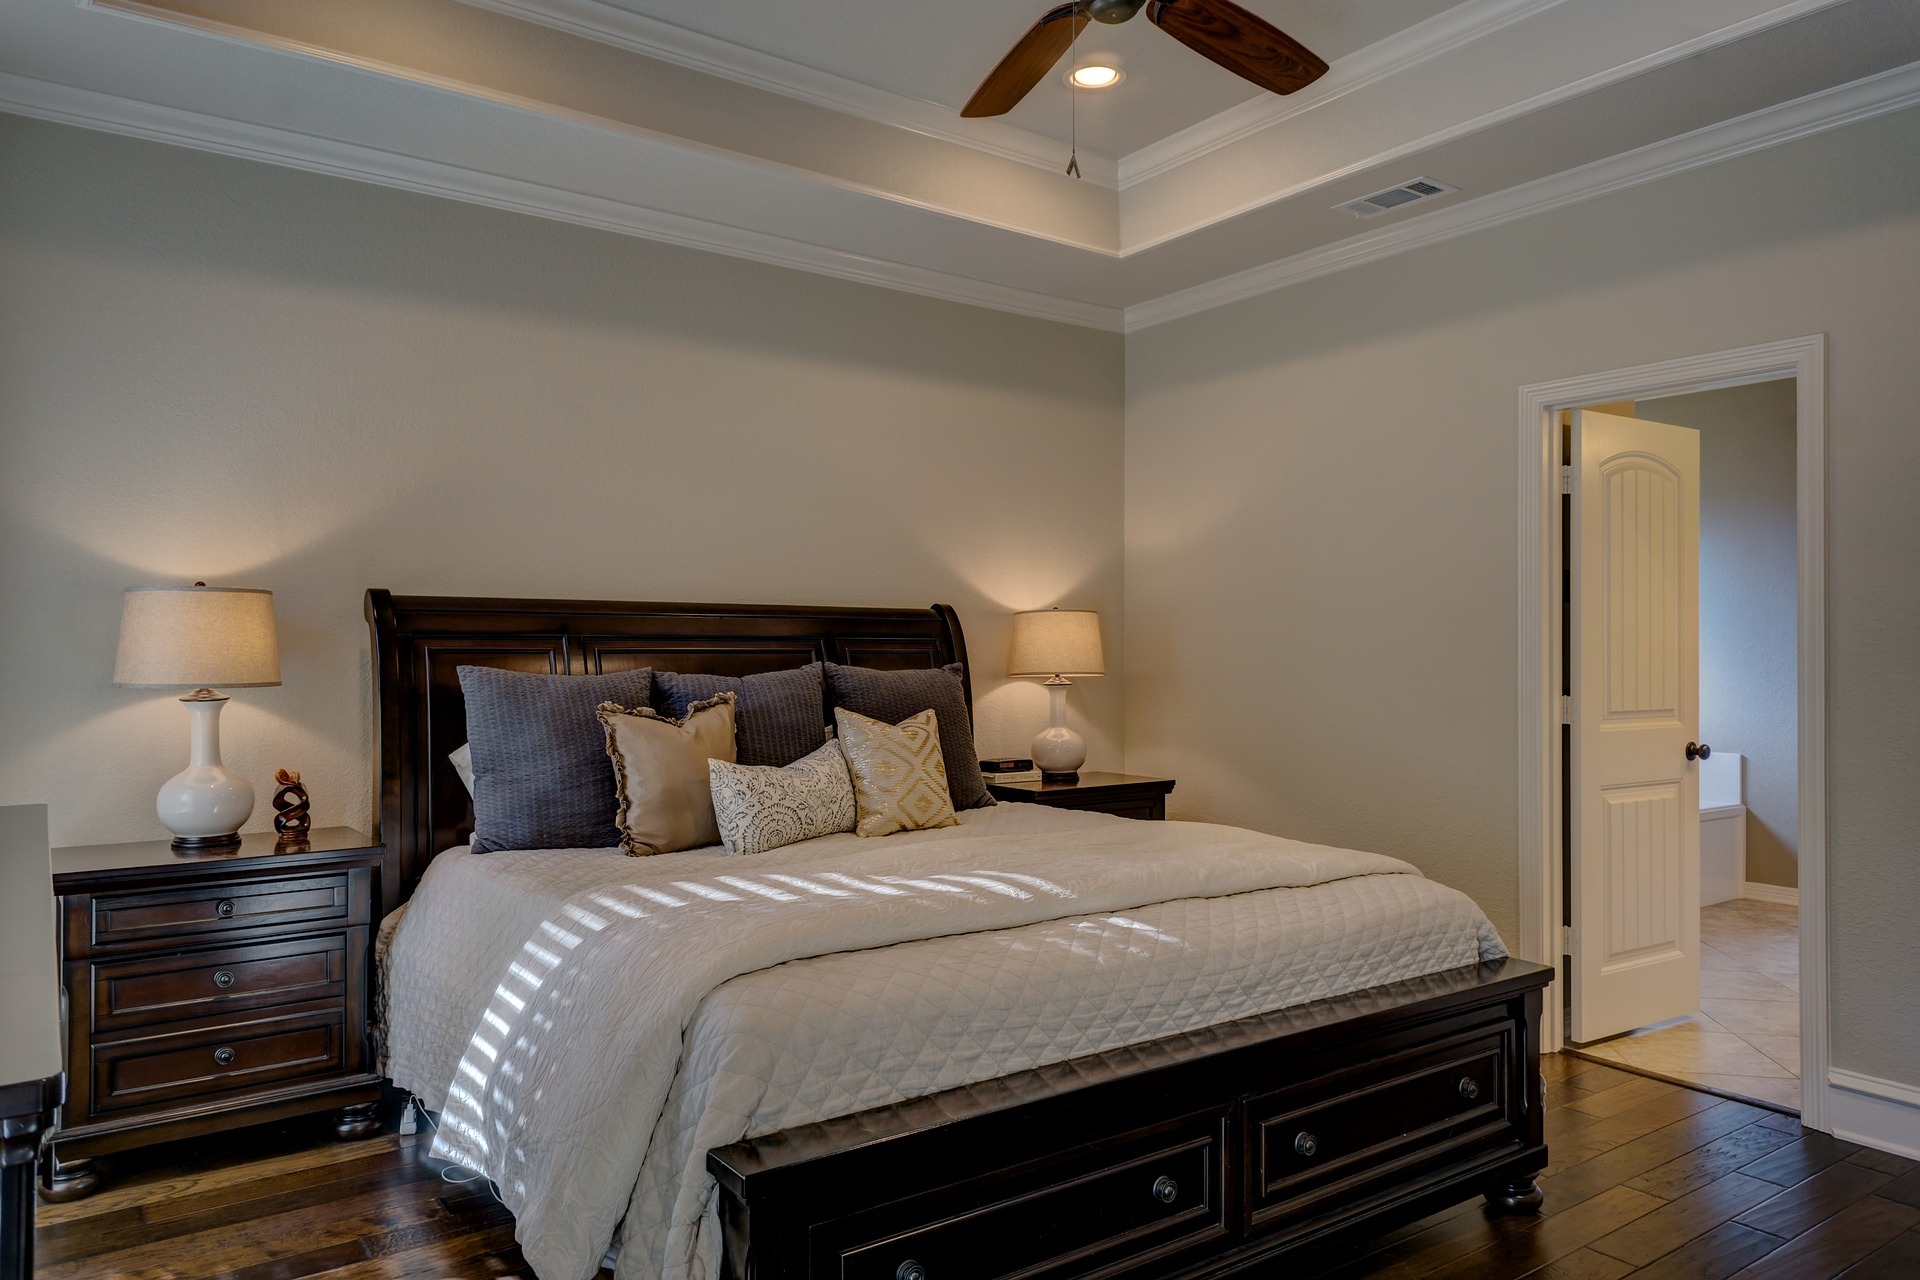 bedroom-1940168_1920.jpg